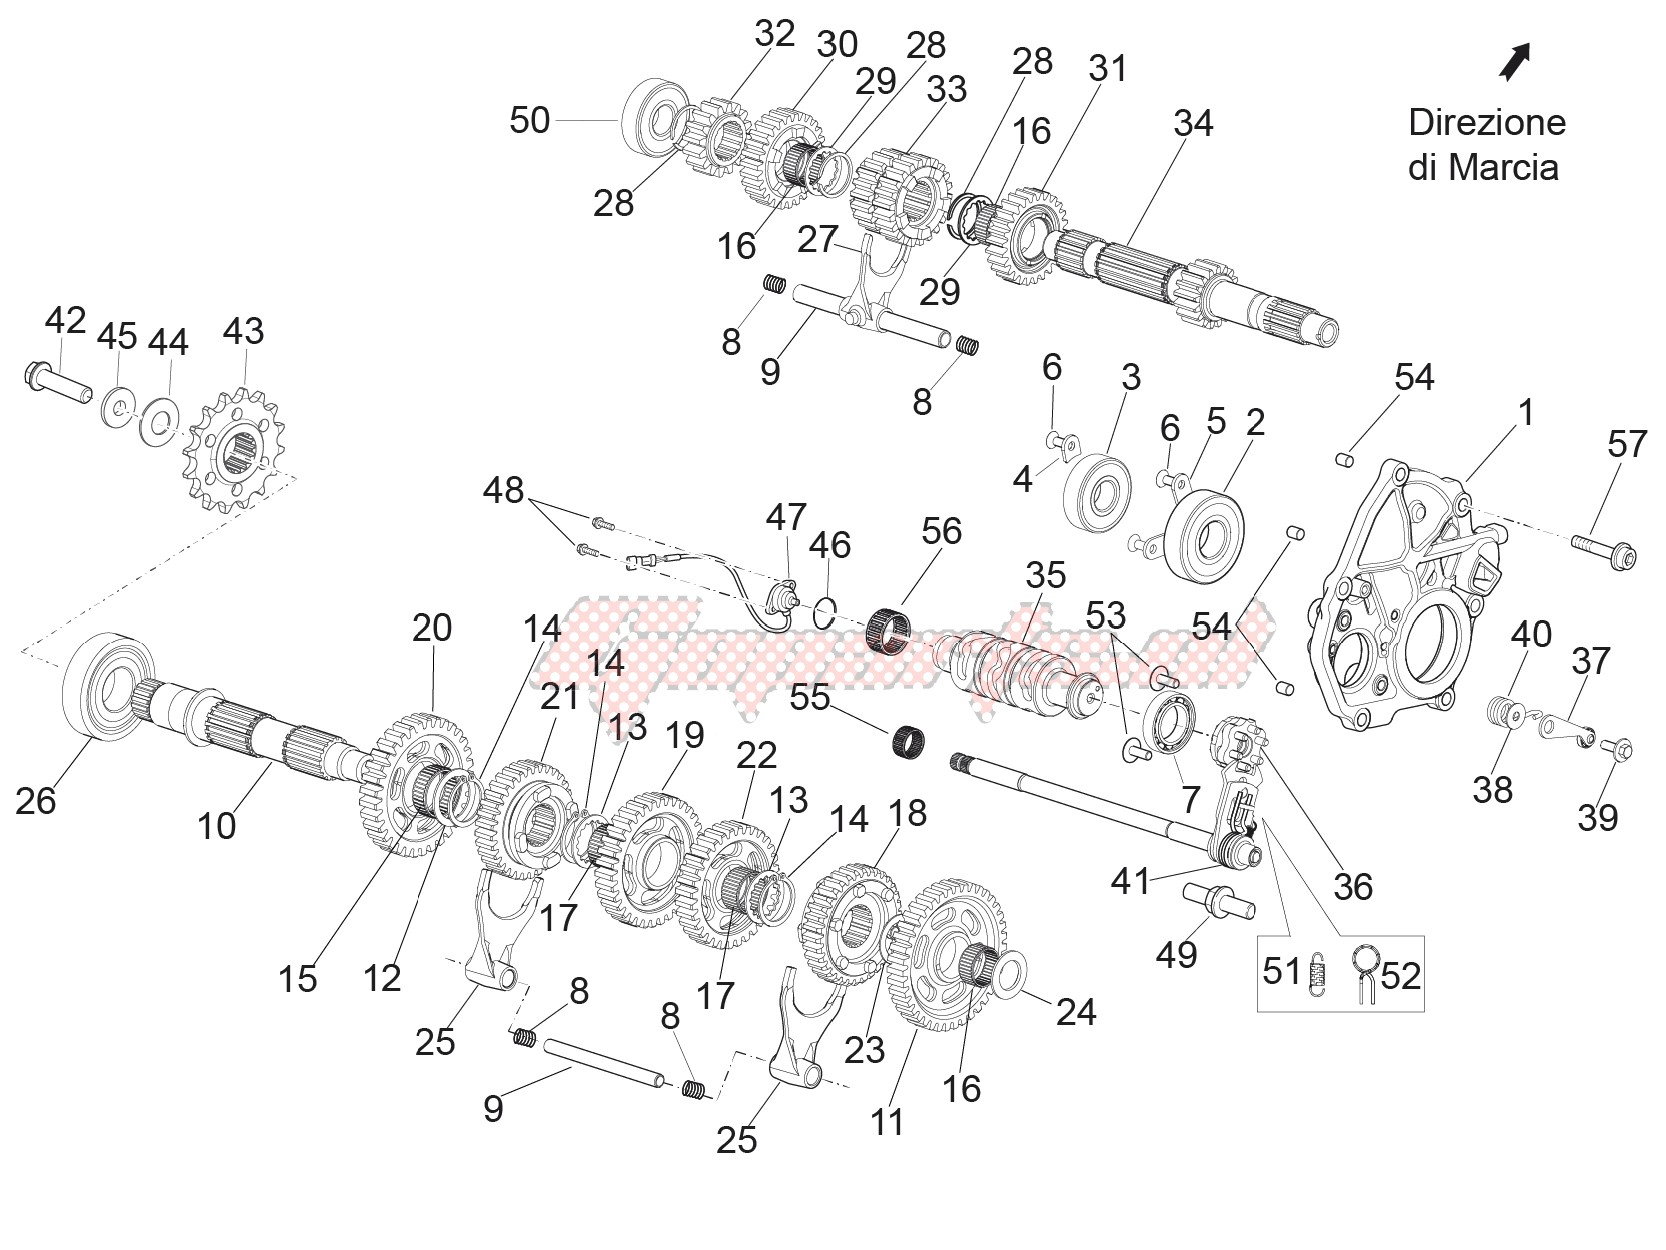 Gear box - Gear assembly image